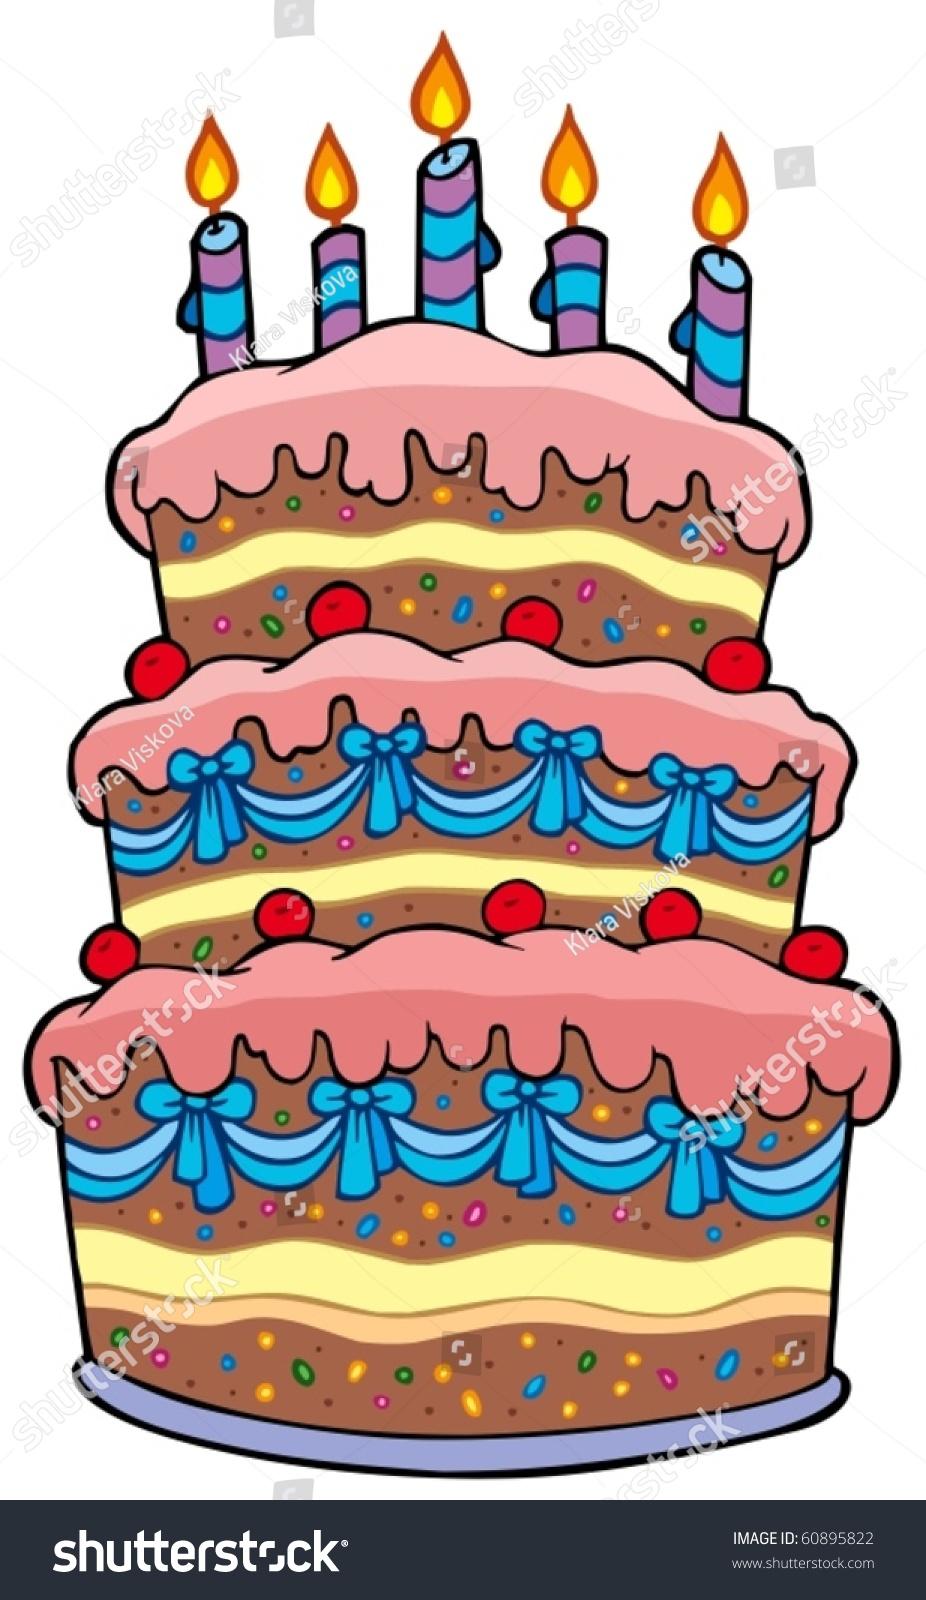 Big Cartoon Cake Candles Vector Illustration Stock